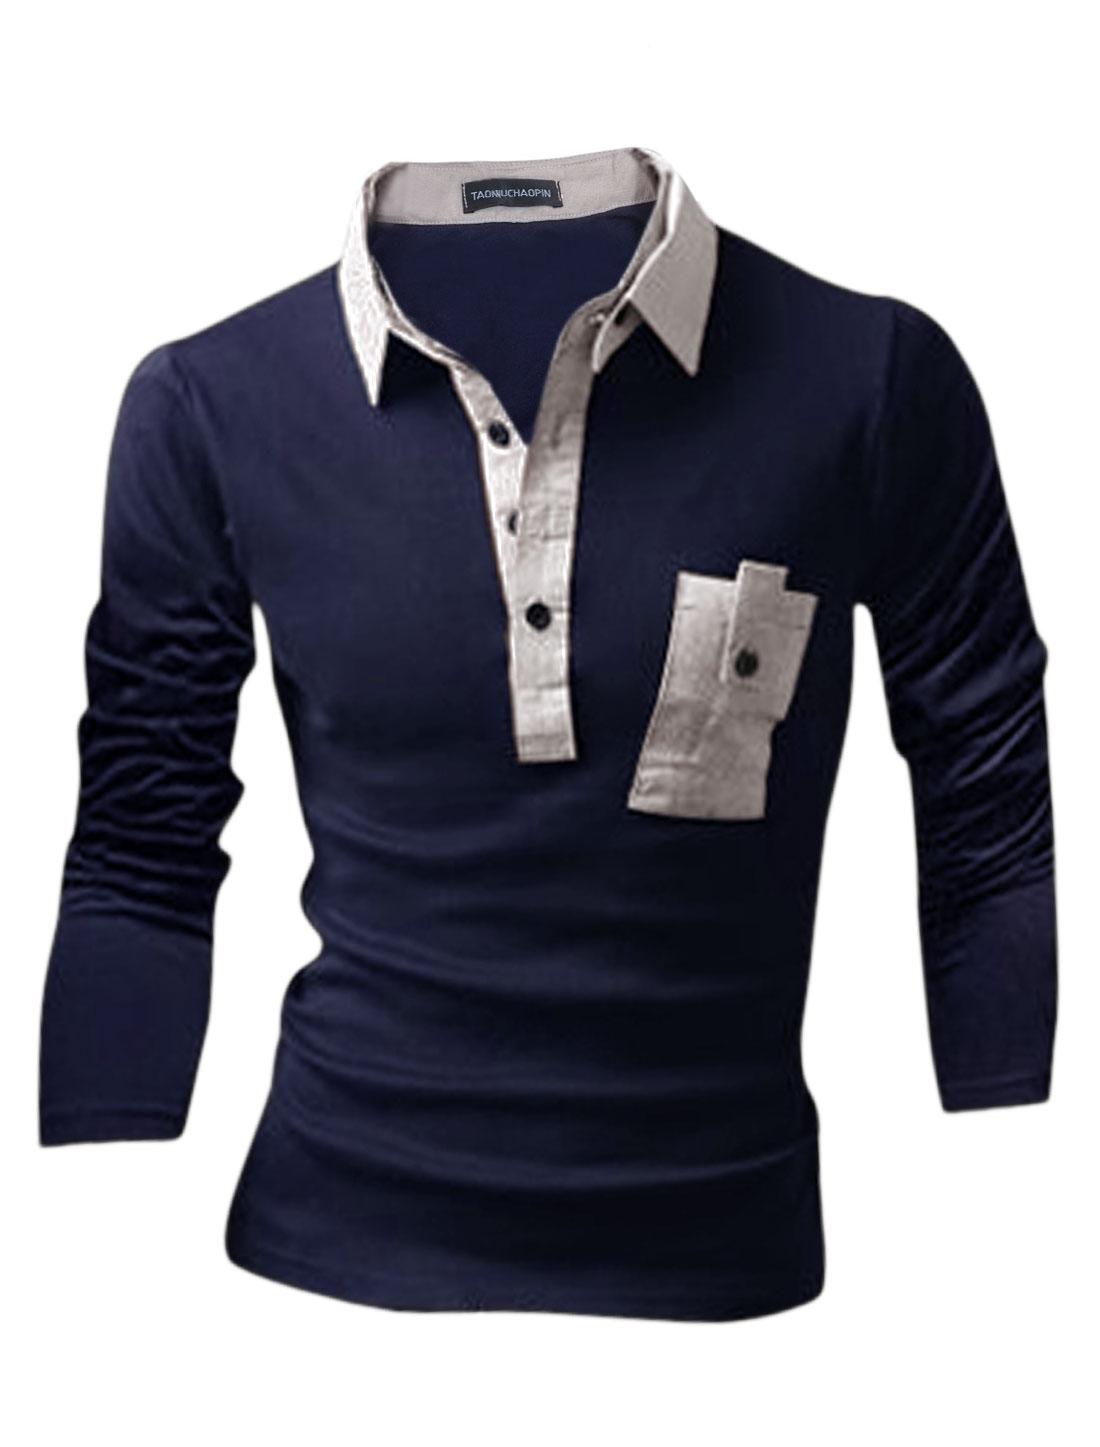 Men Four-Button Placket Detachable Turn Down Collar Polo Shirt Navy Blue M